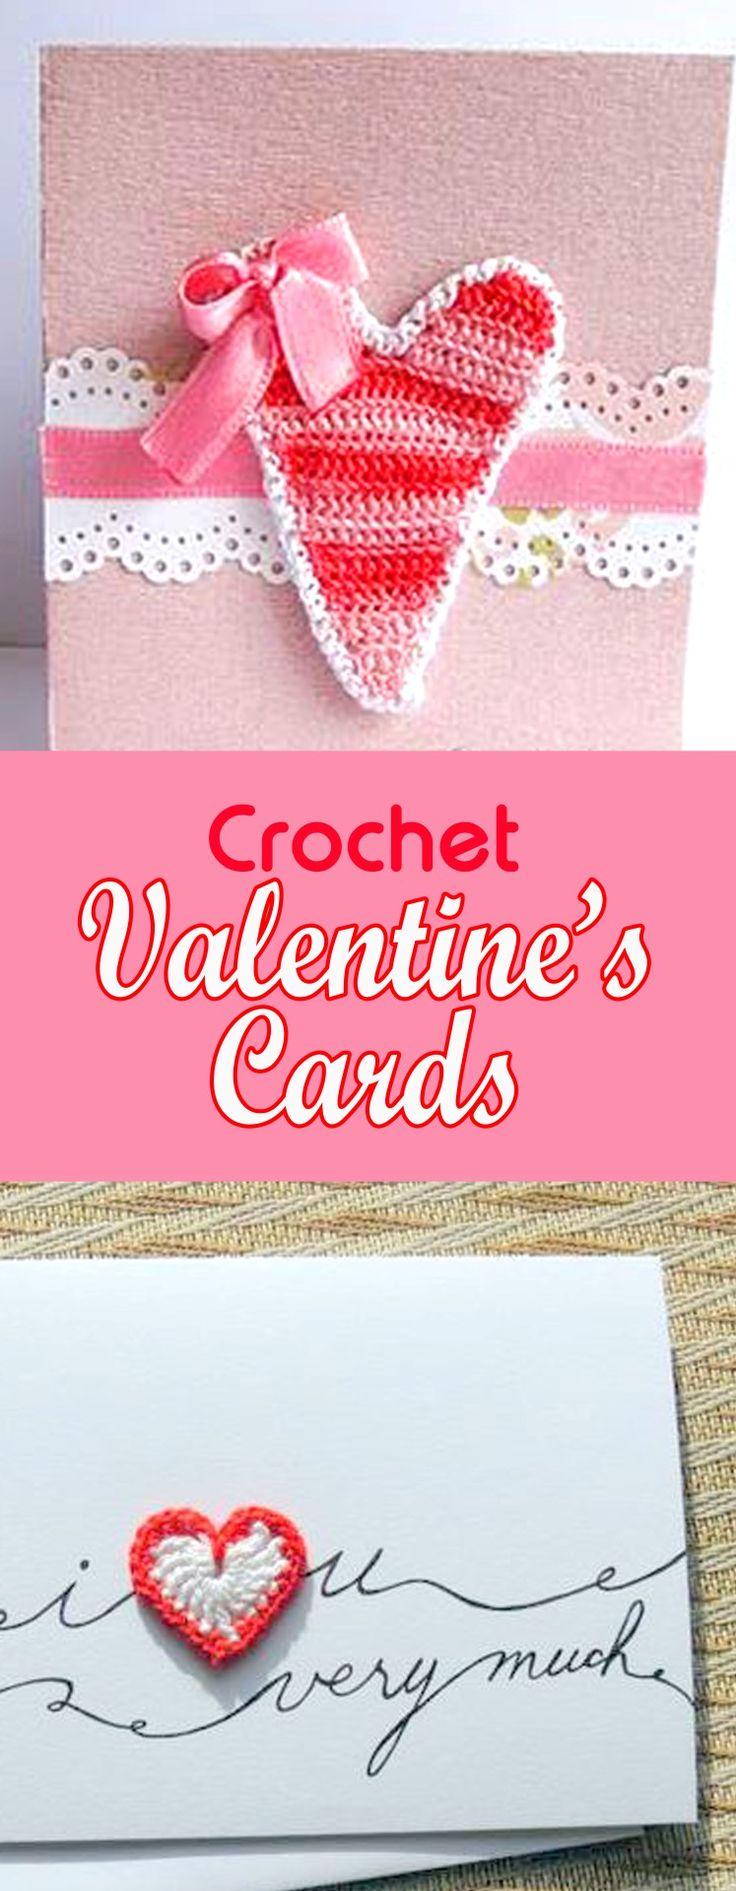 Crochet Valentine's Card, Crochet Valentine's Card inspiration, heart card, crochet heart card, crochet applique card, crochet applique heart card,crochet applique heart valentine's card, crochet applique valentine's card;